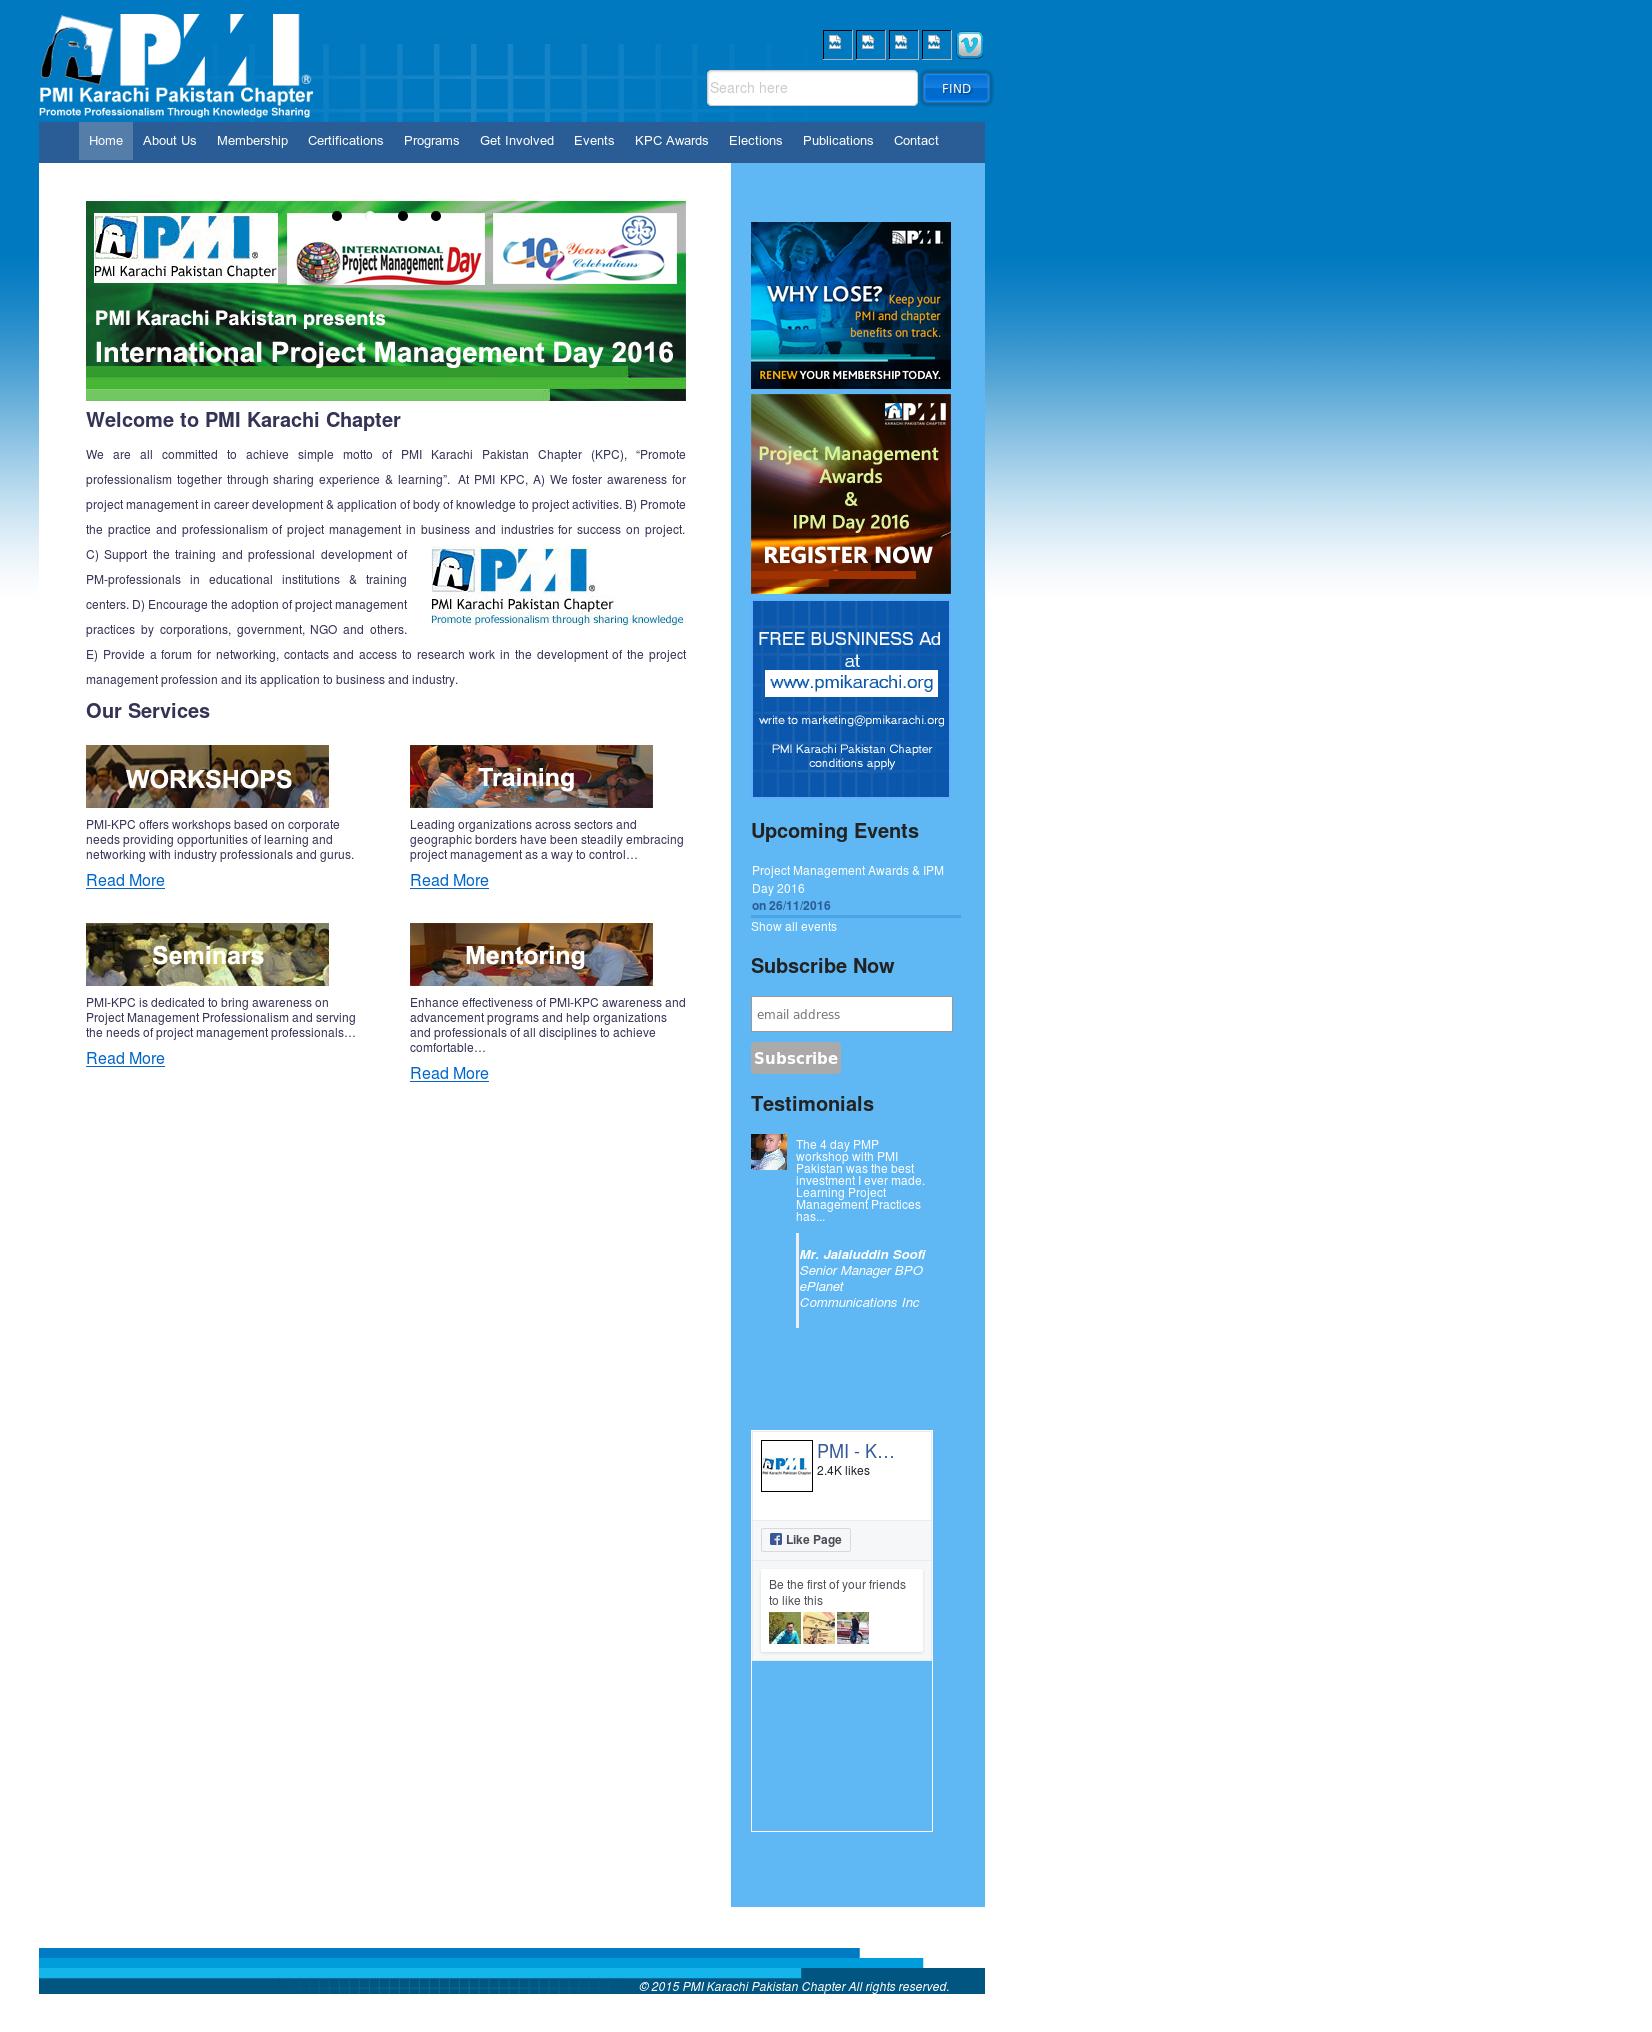 Pmi - Karachi Pakistan Chapter Competitors, Revenue and Employees